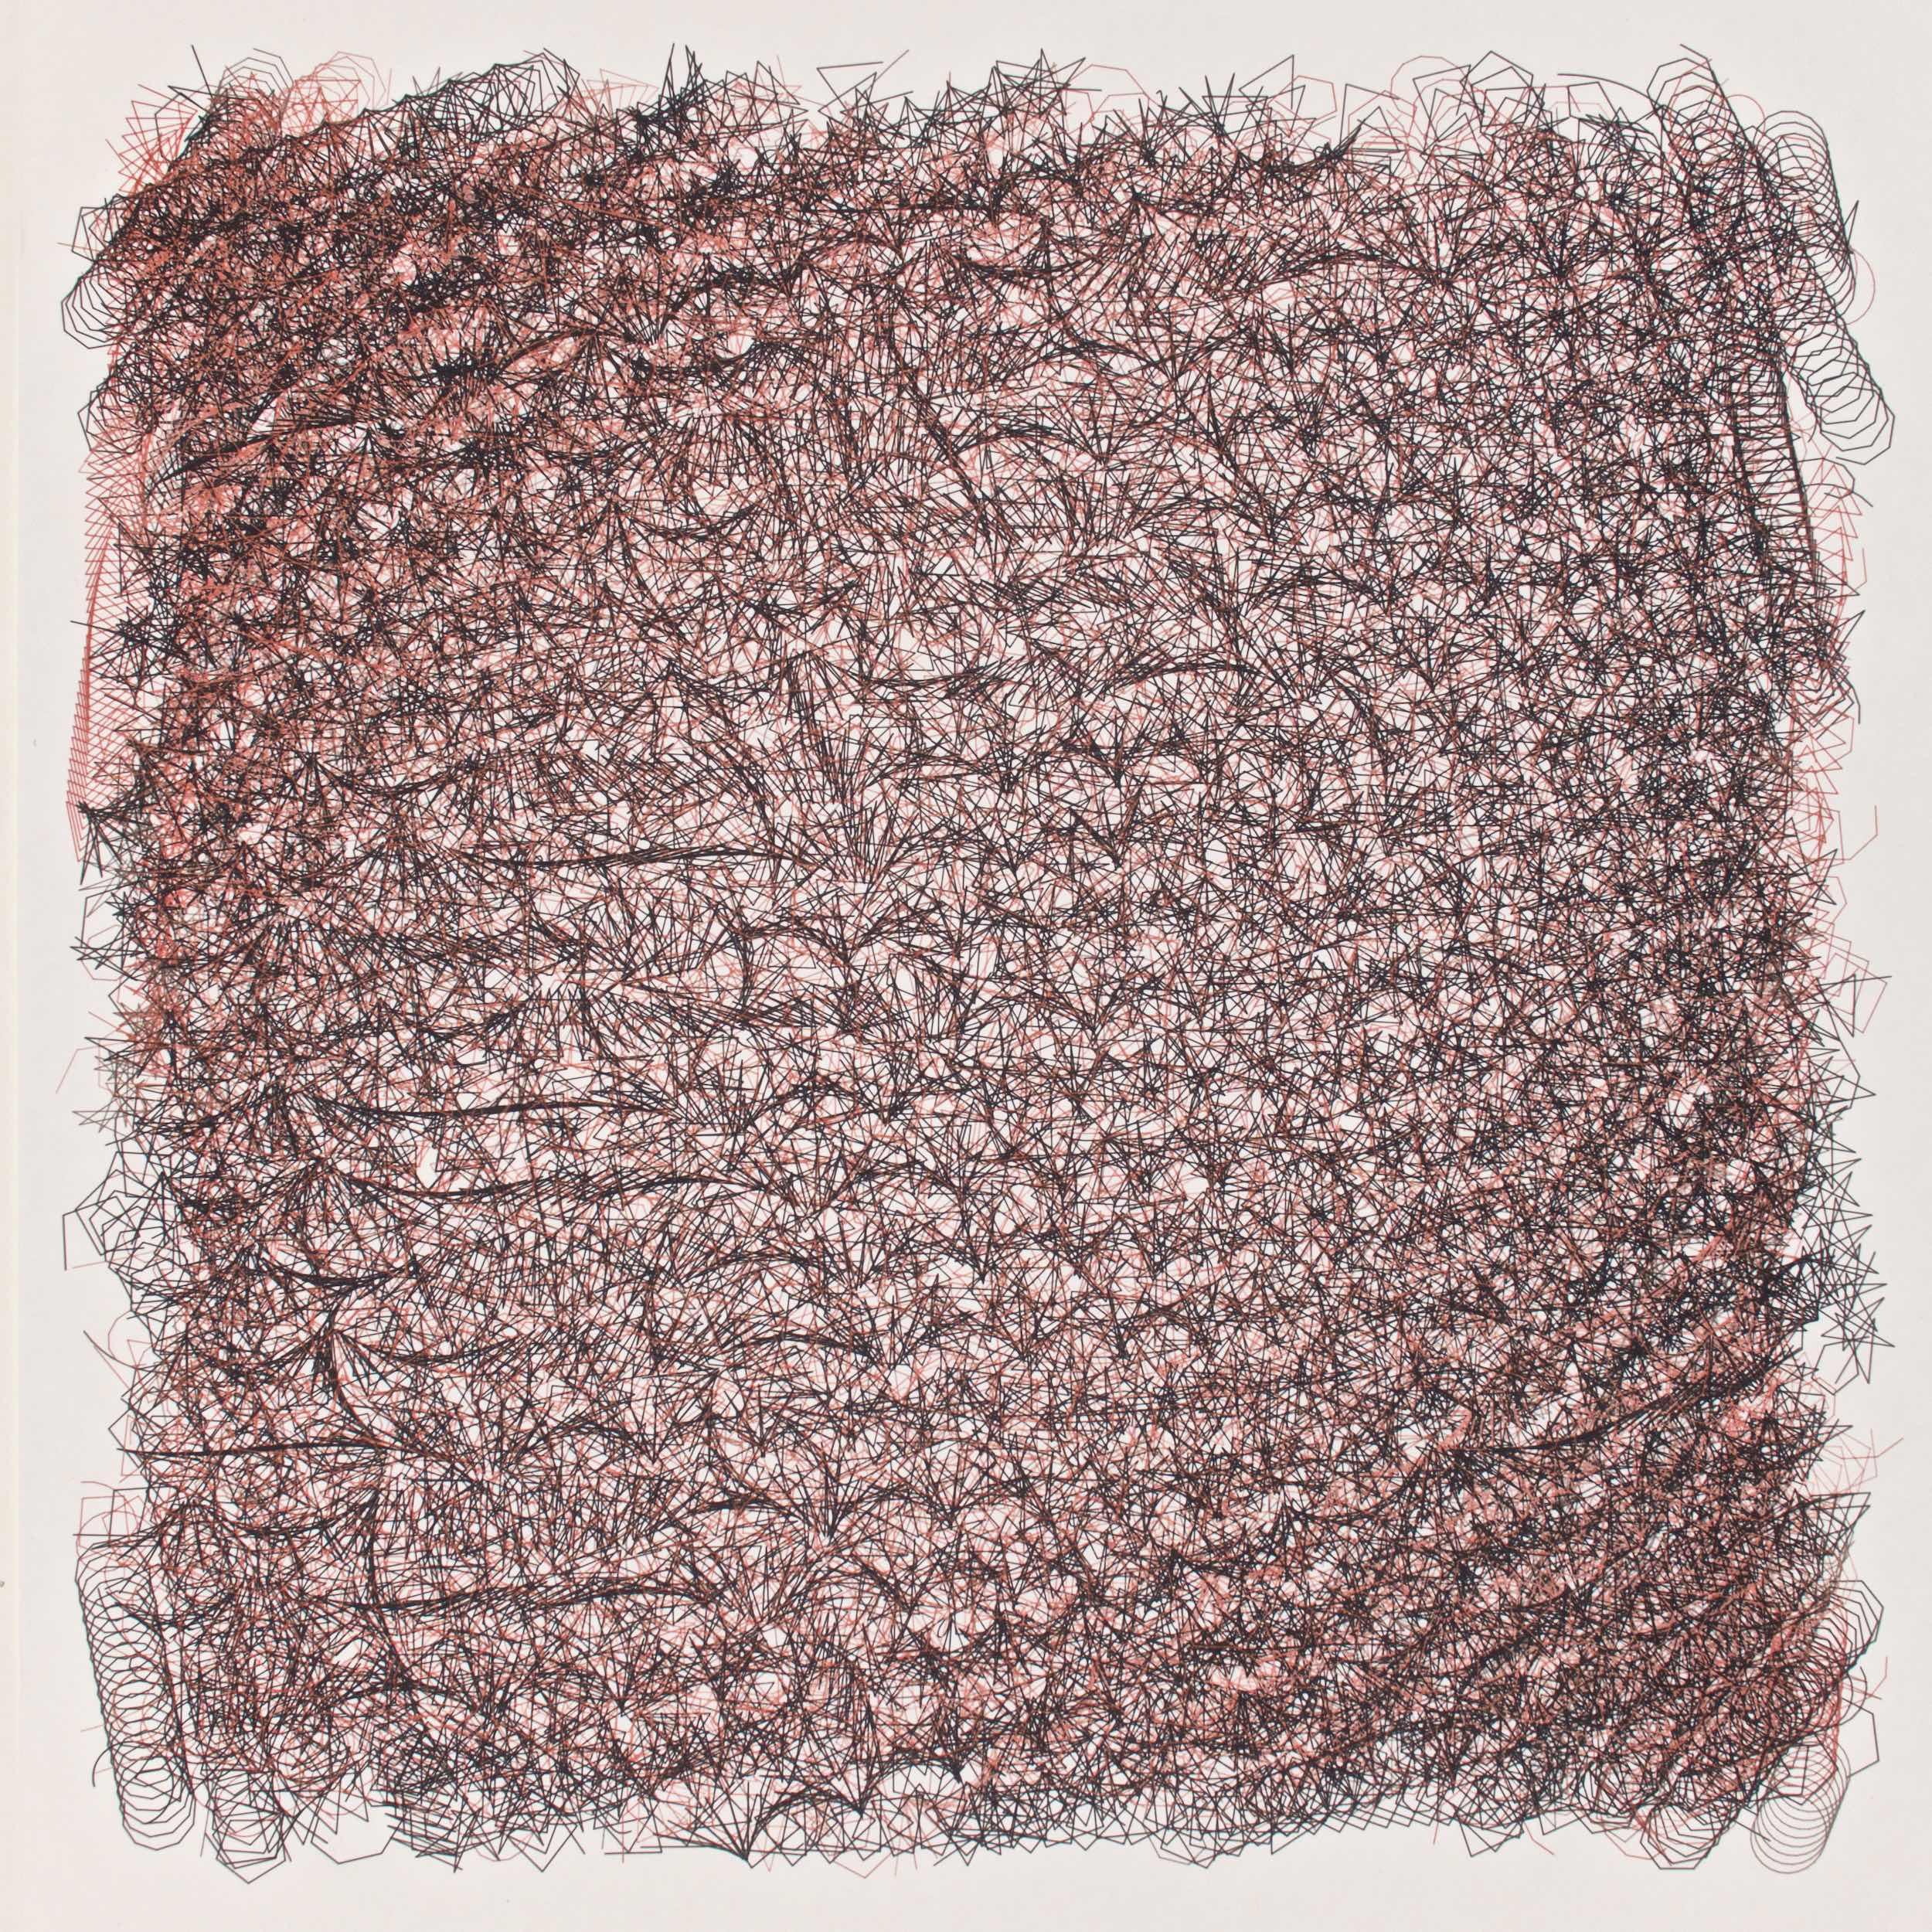 Jean-Pierre Hébert, Reddish Brown Chaos II, Pigmenttinte auf Niyodo Papier, 41 x 41 cm, 2015